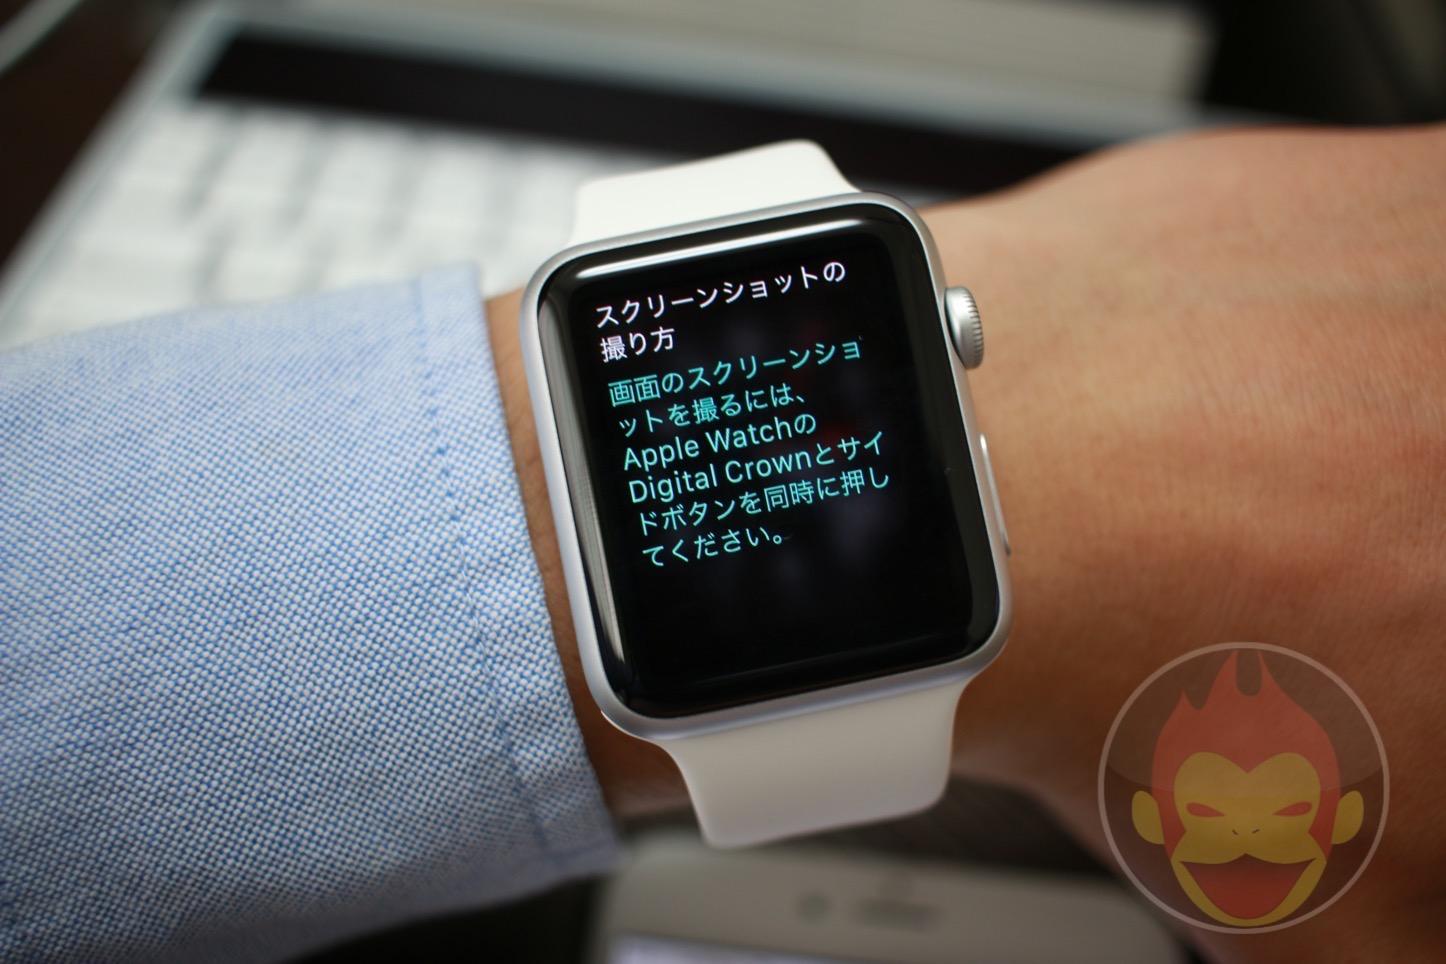 Apple Watch Screen Shot 01